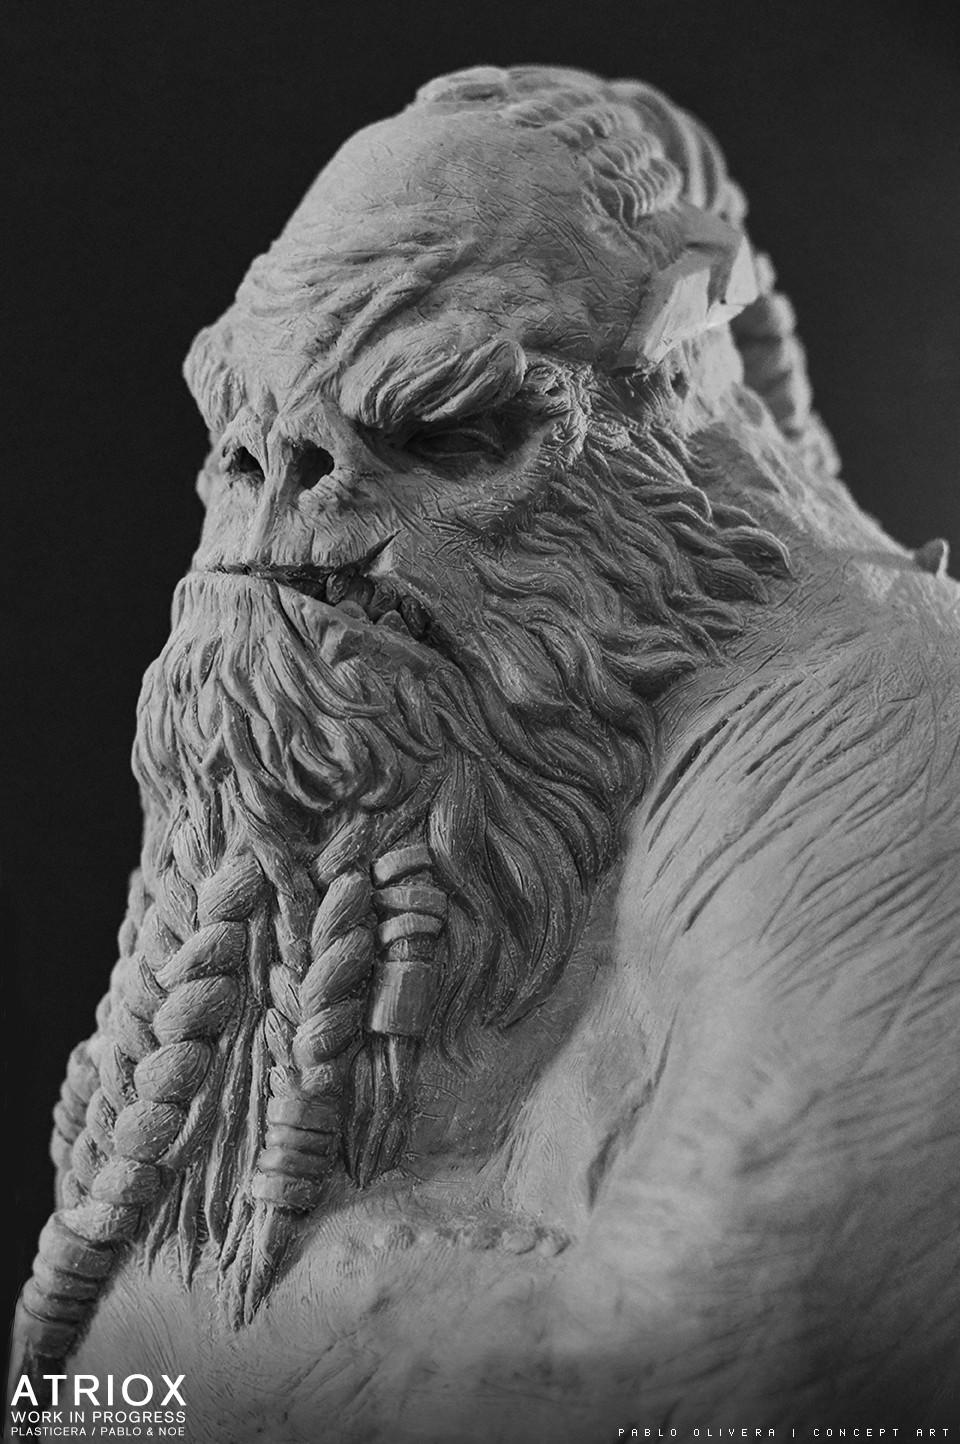 Pablo olivera atriox sculpture plasticera by pablo olivera 01